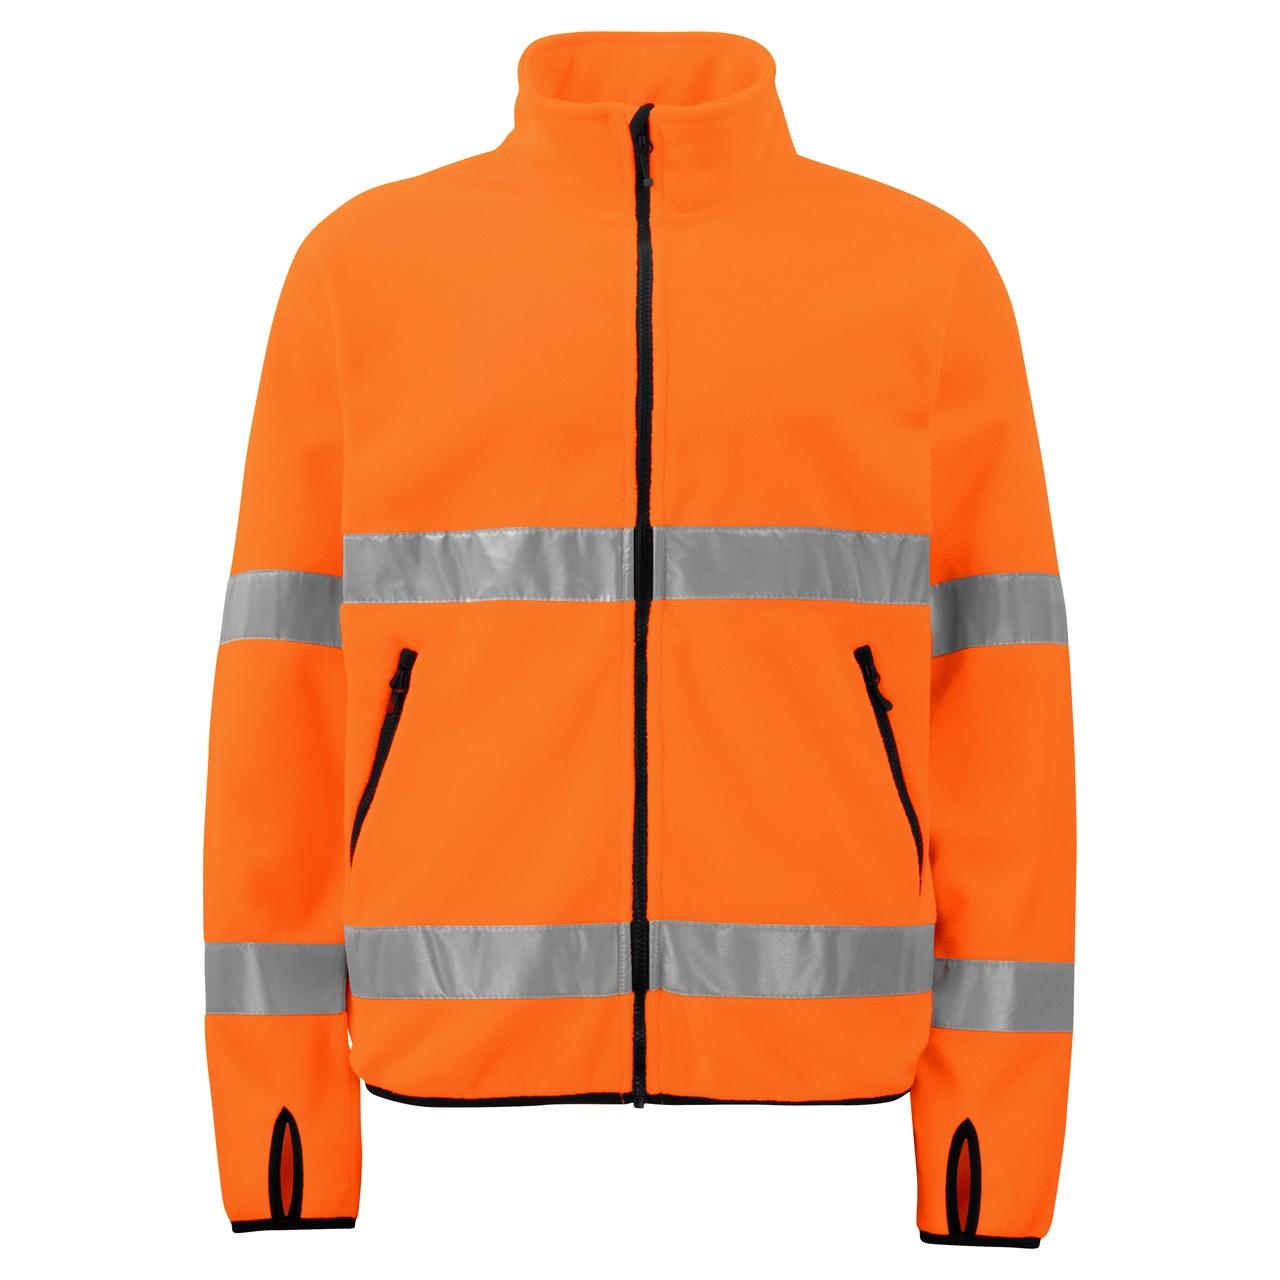 Warnschutz Sicherheits-Fleecejacke Projob® | bedrucken, besticken, bedrucken lassen, besticken lassen, mit Logo |